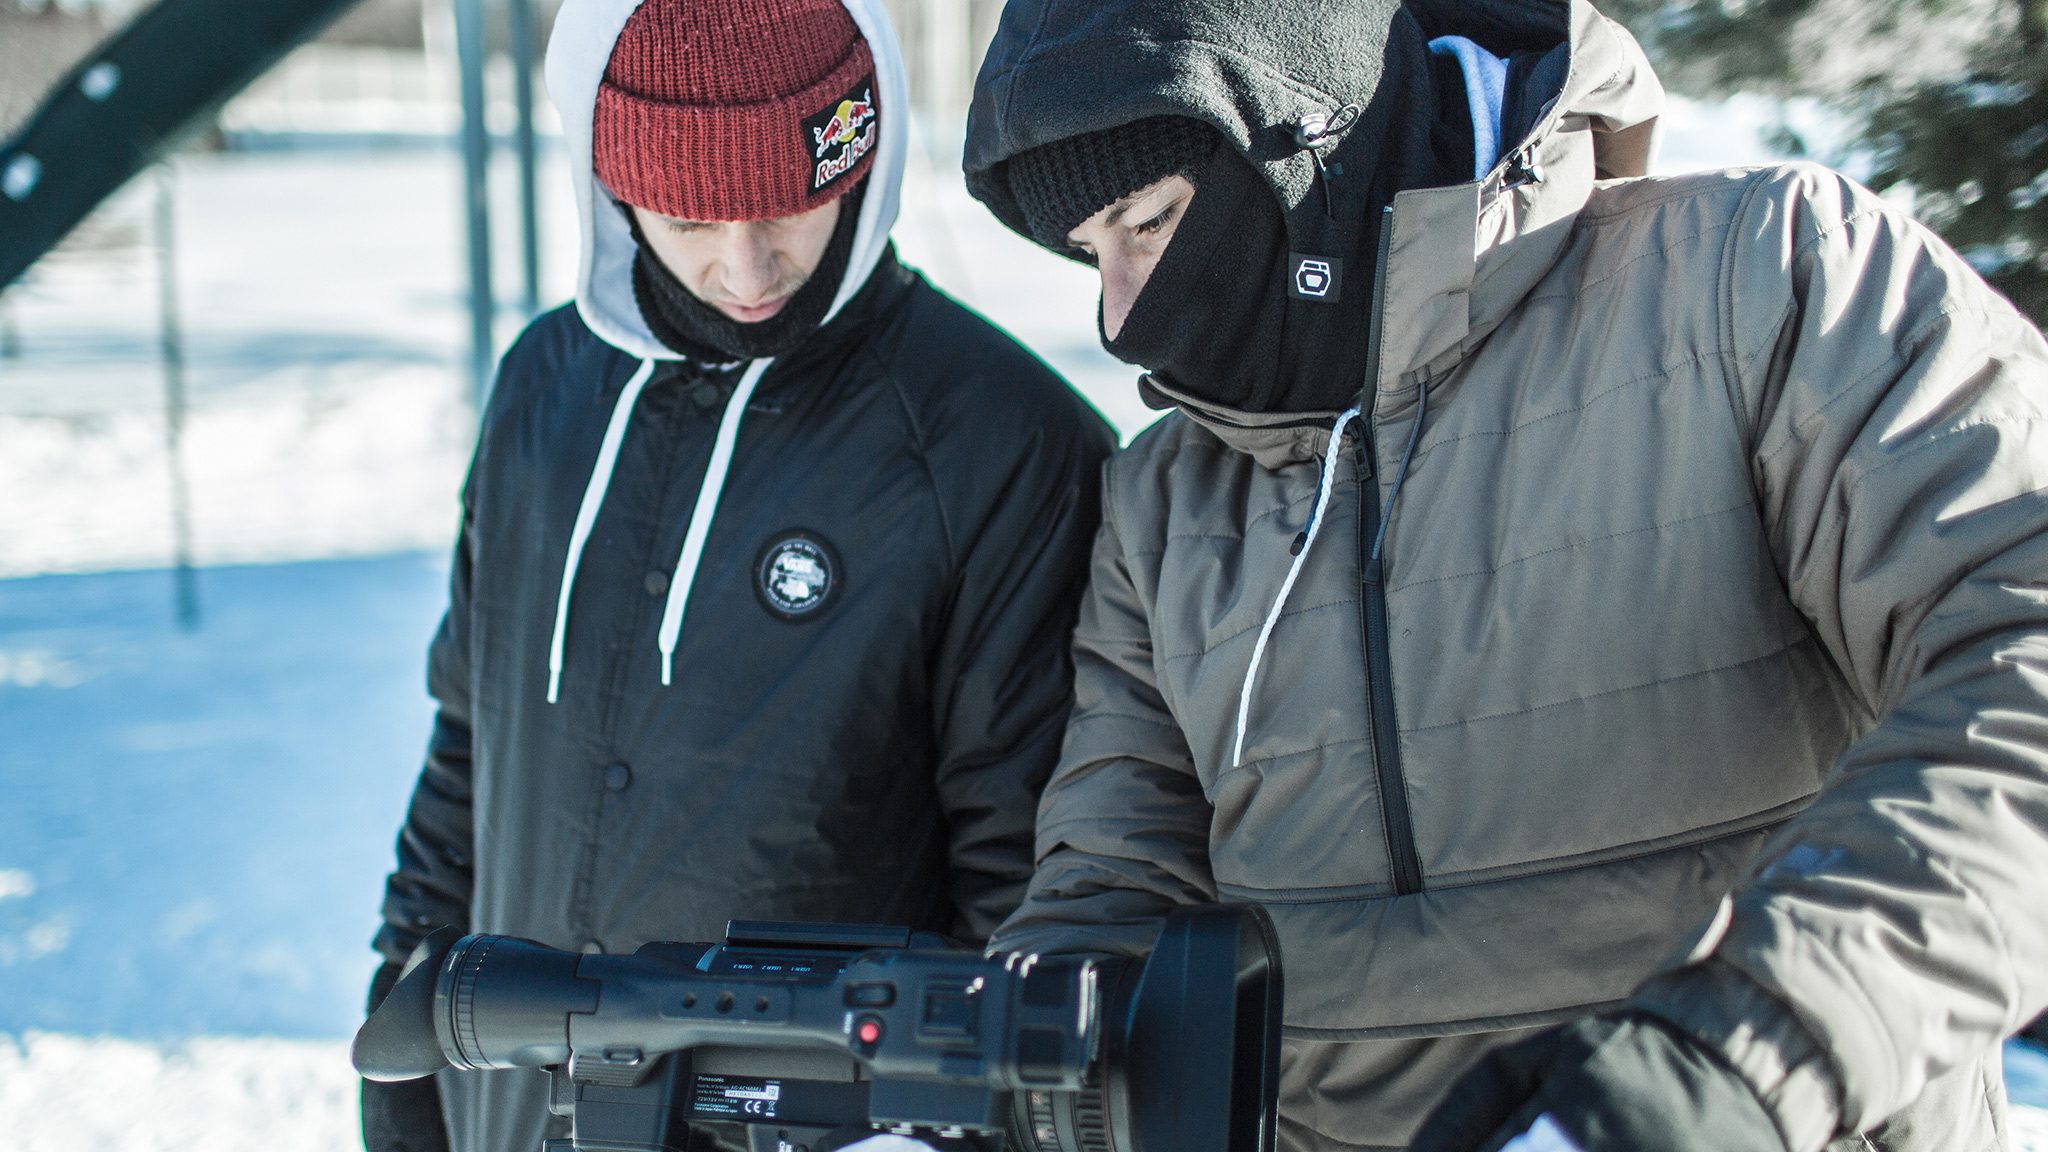 Urban's Filmer: Alex Pfeffer